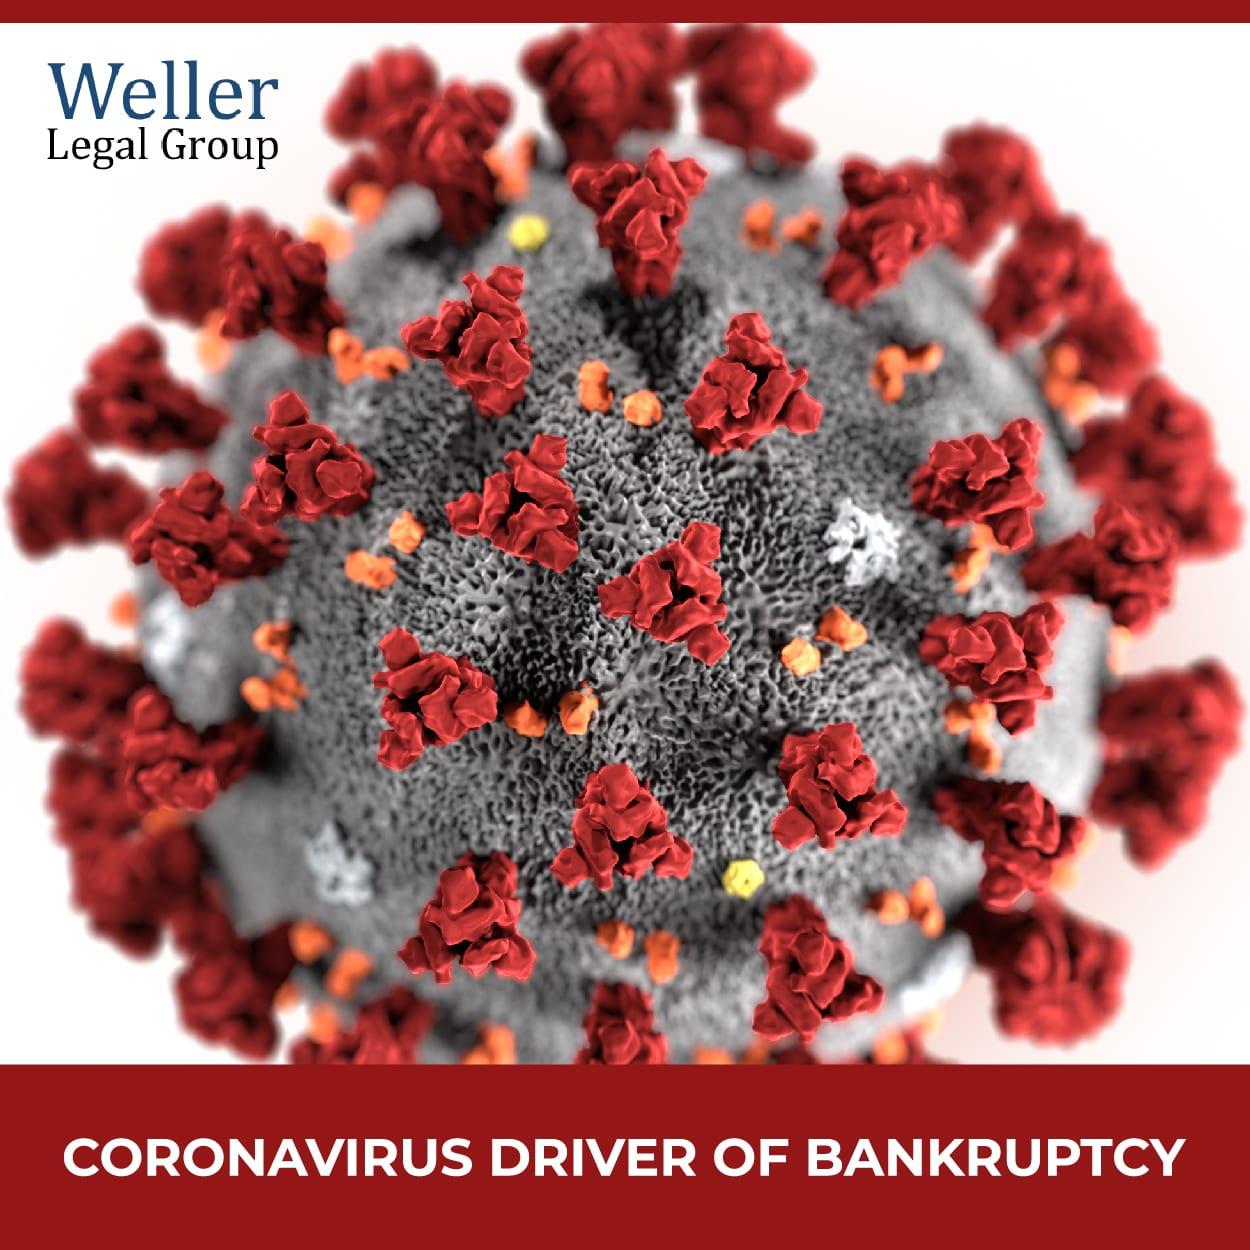 CORONAVIRUS DRIVER OF BANKRUPTCY